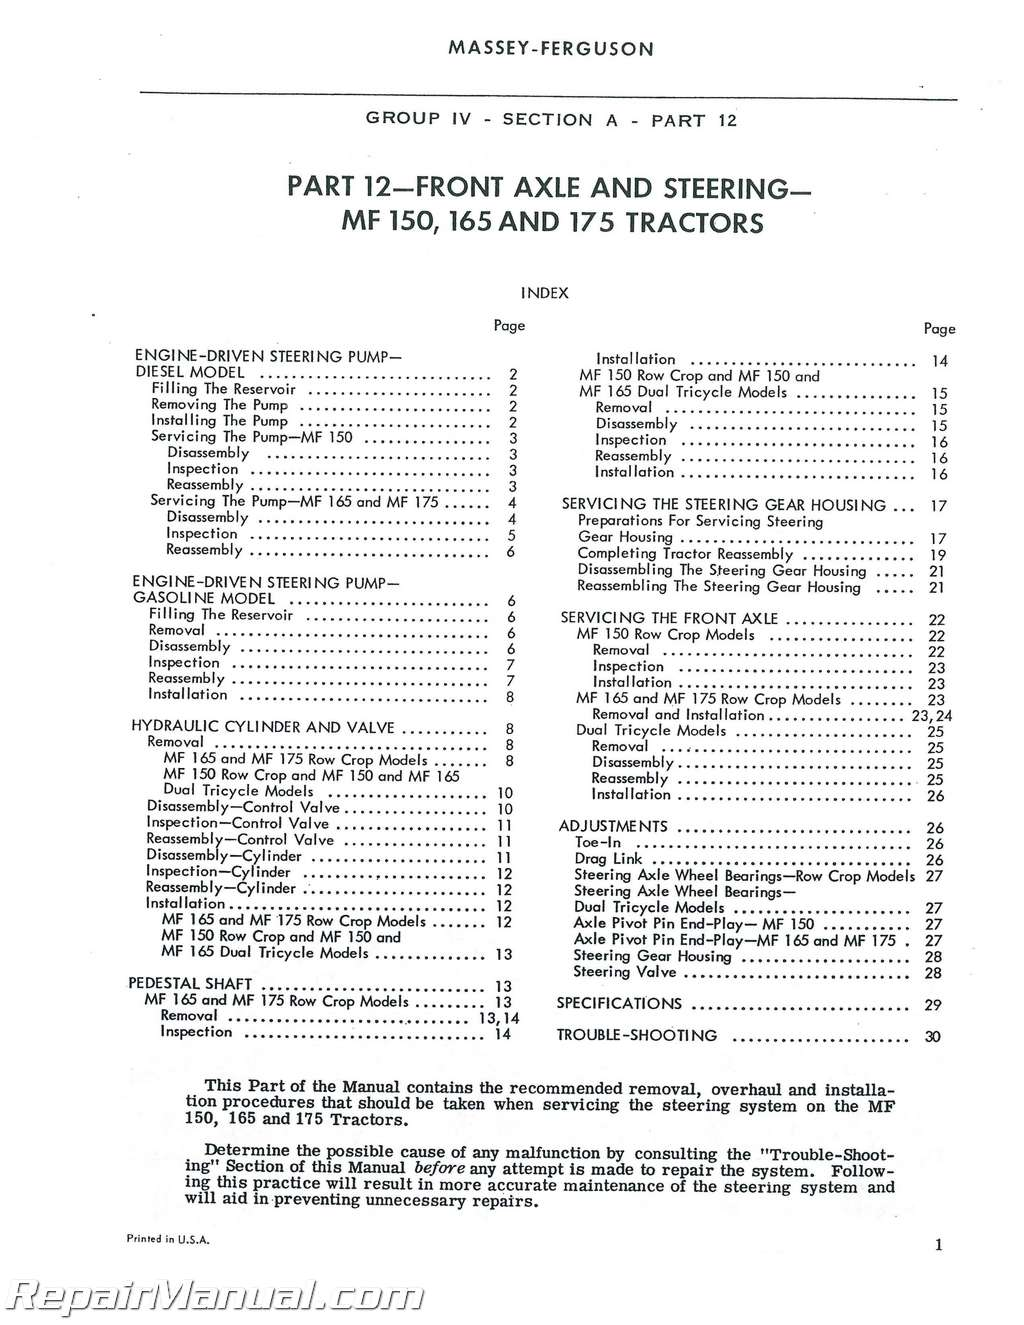 massey ferguson 175 parts diagram wiring for car stereo toyota mf150 mf165 mf175 mf180 tractor service manual